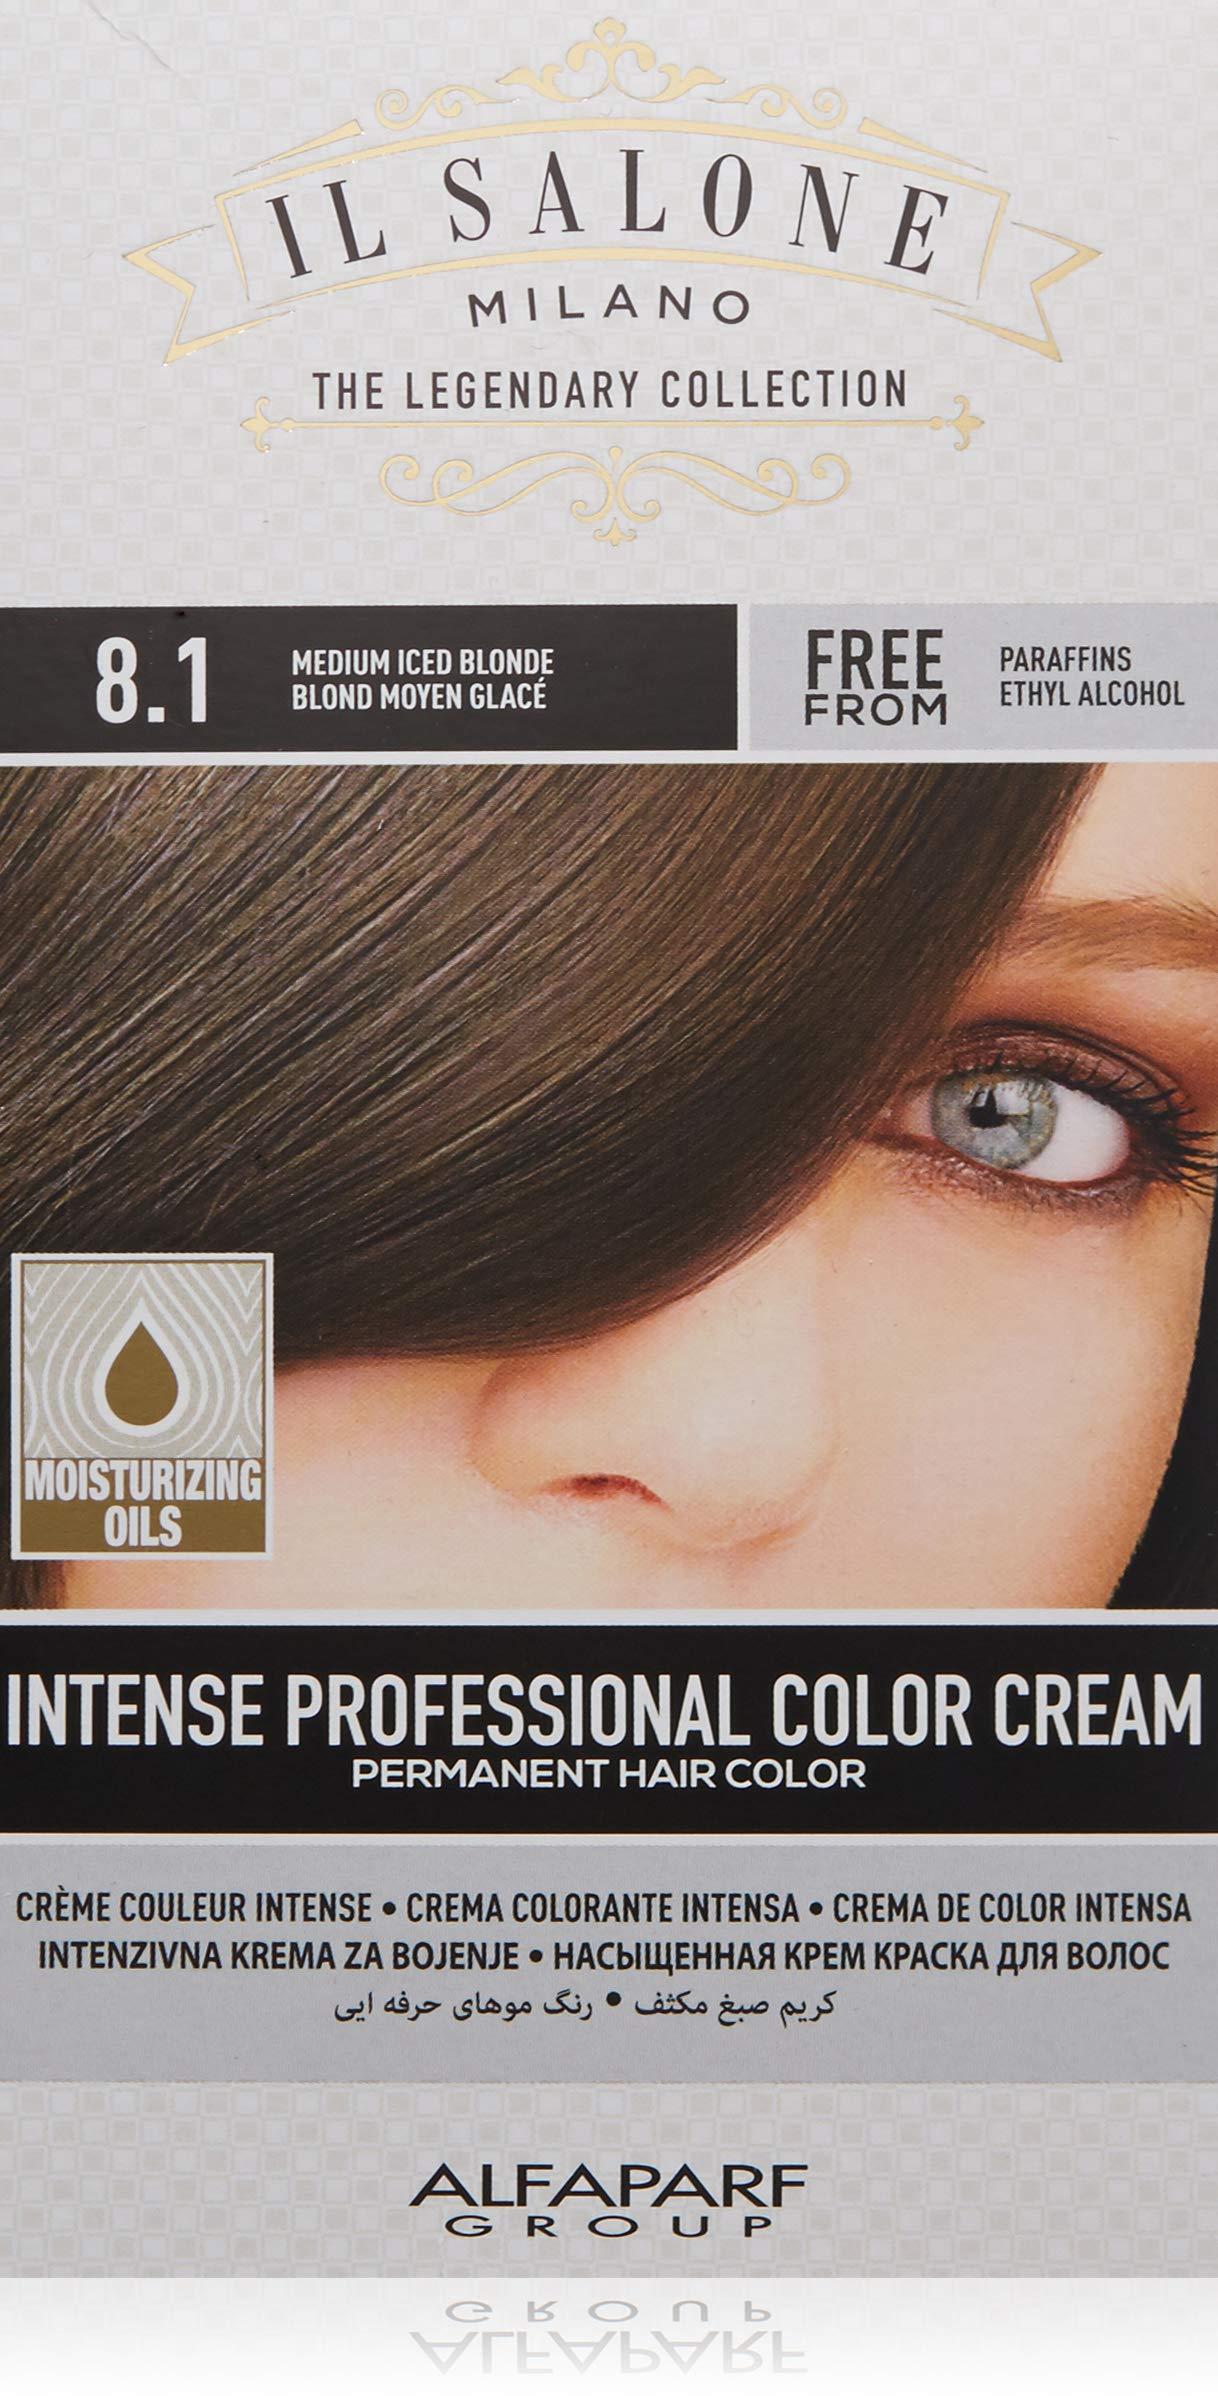 Il Salone Milano Permanent Hair Color Cream - 8.1 Medium Iced Blonde Hair Dye - Professional Salon - Premium Quality - 100% Gray Coverage - Paraben Free - Ethyl Alcohol Free - Moisturizing Oils